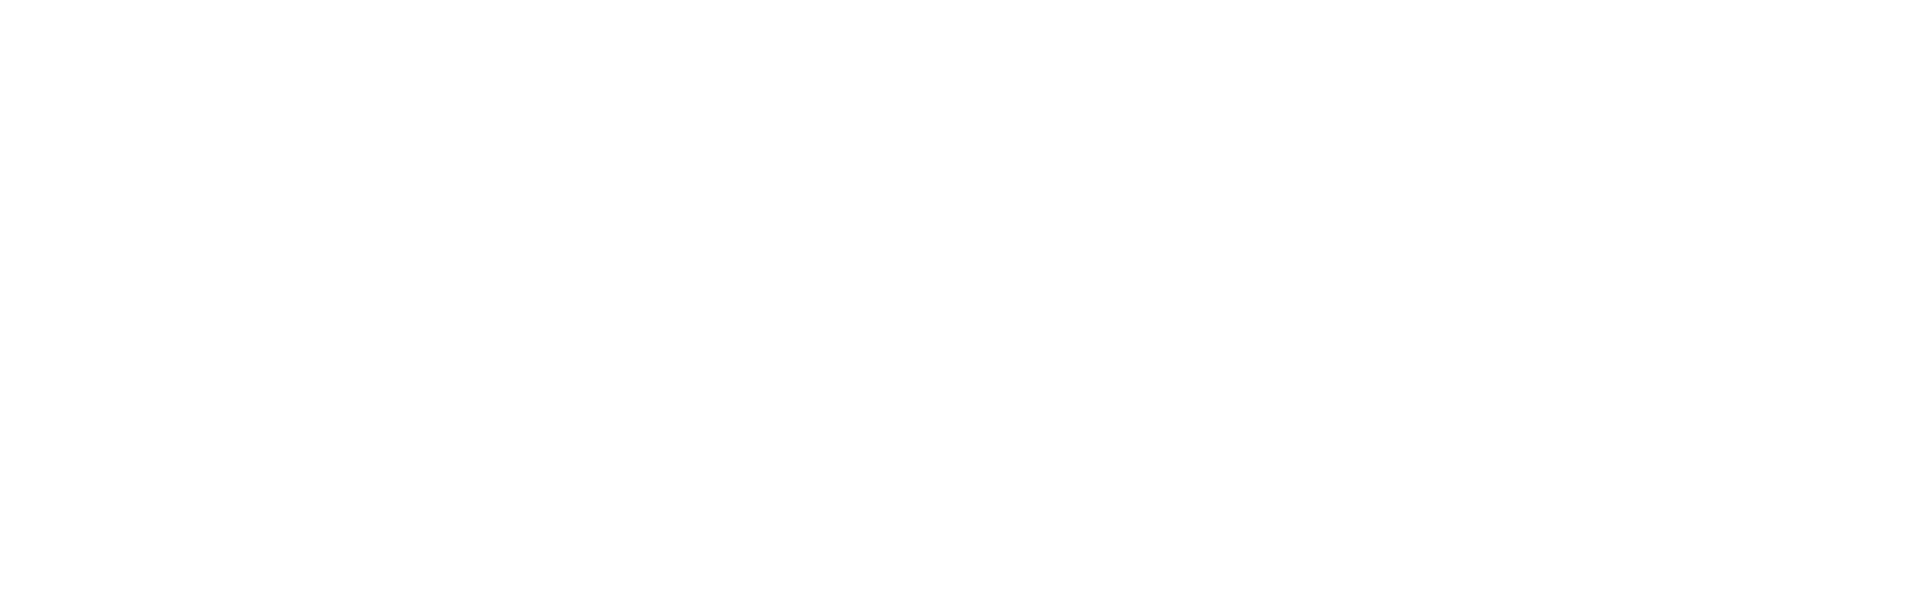 South Australian made icon